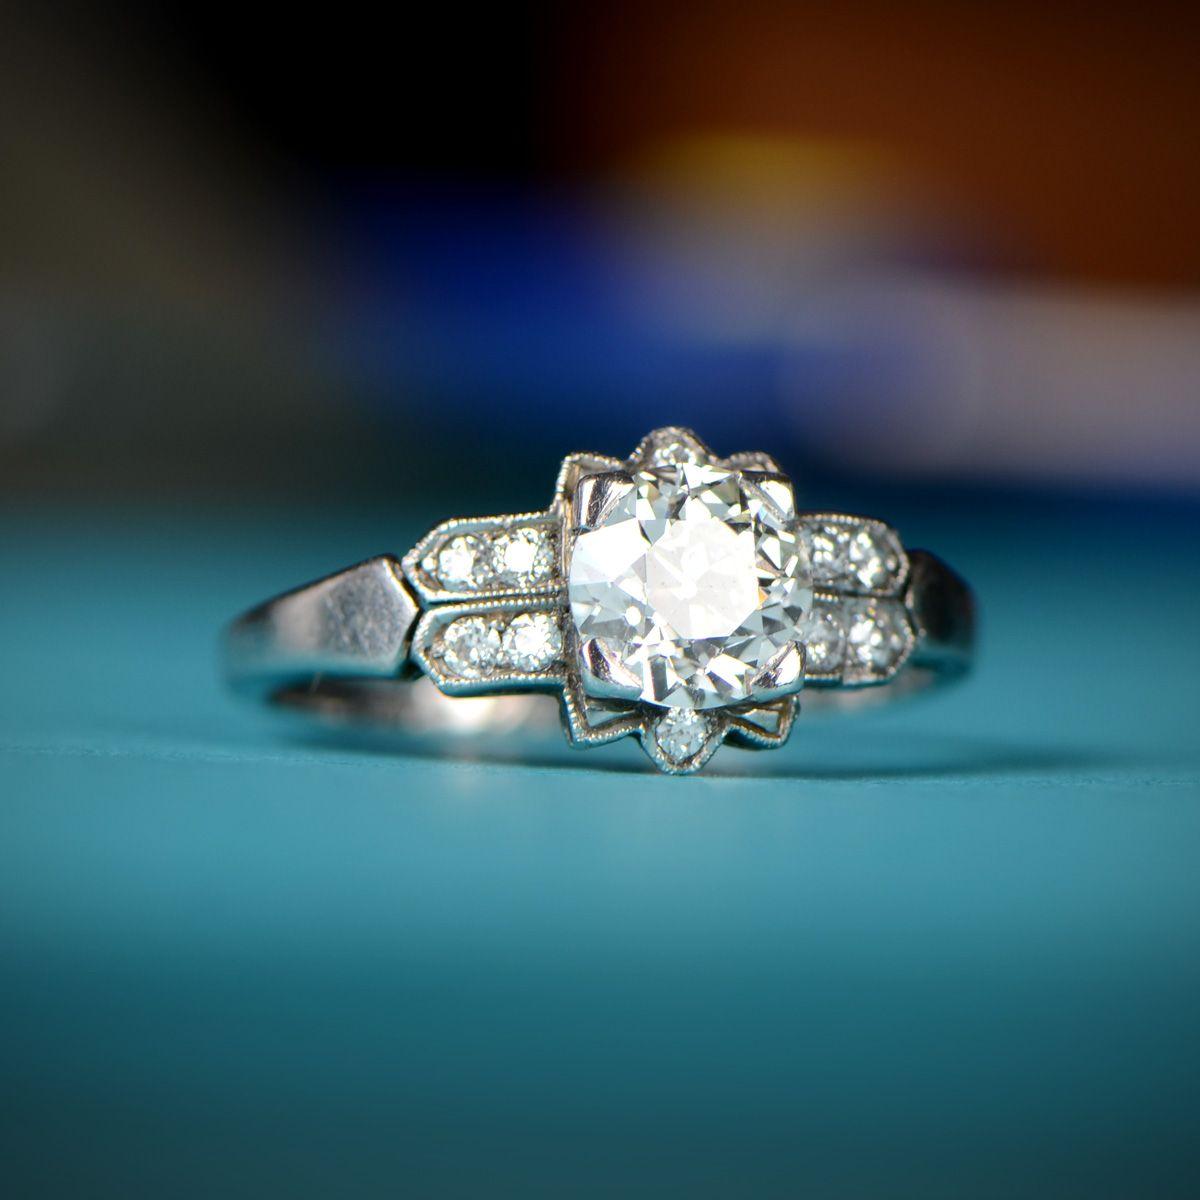 Engagement Rings Hobart: Vintage Engagement Rings